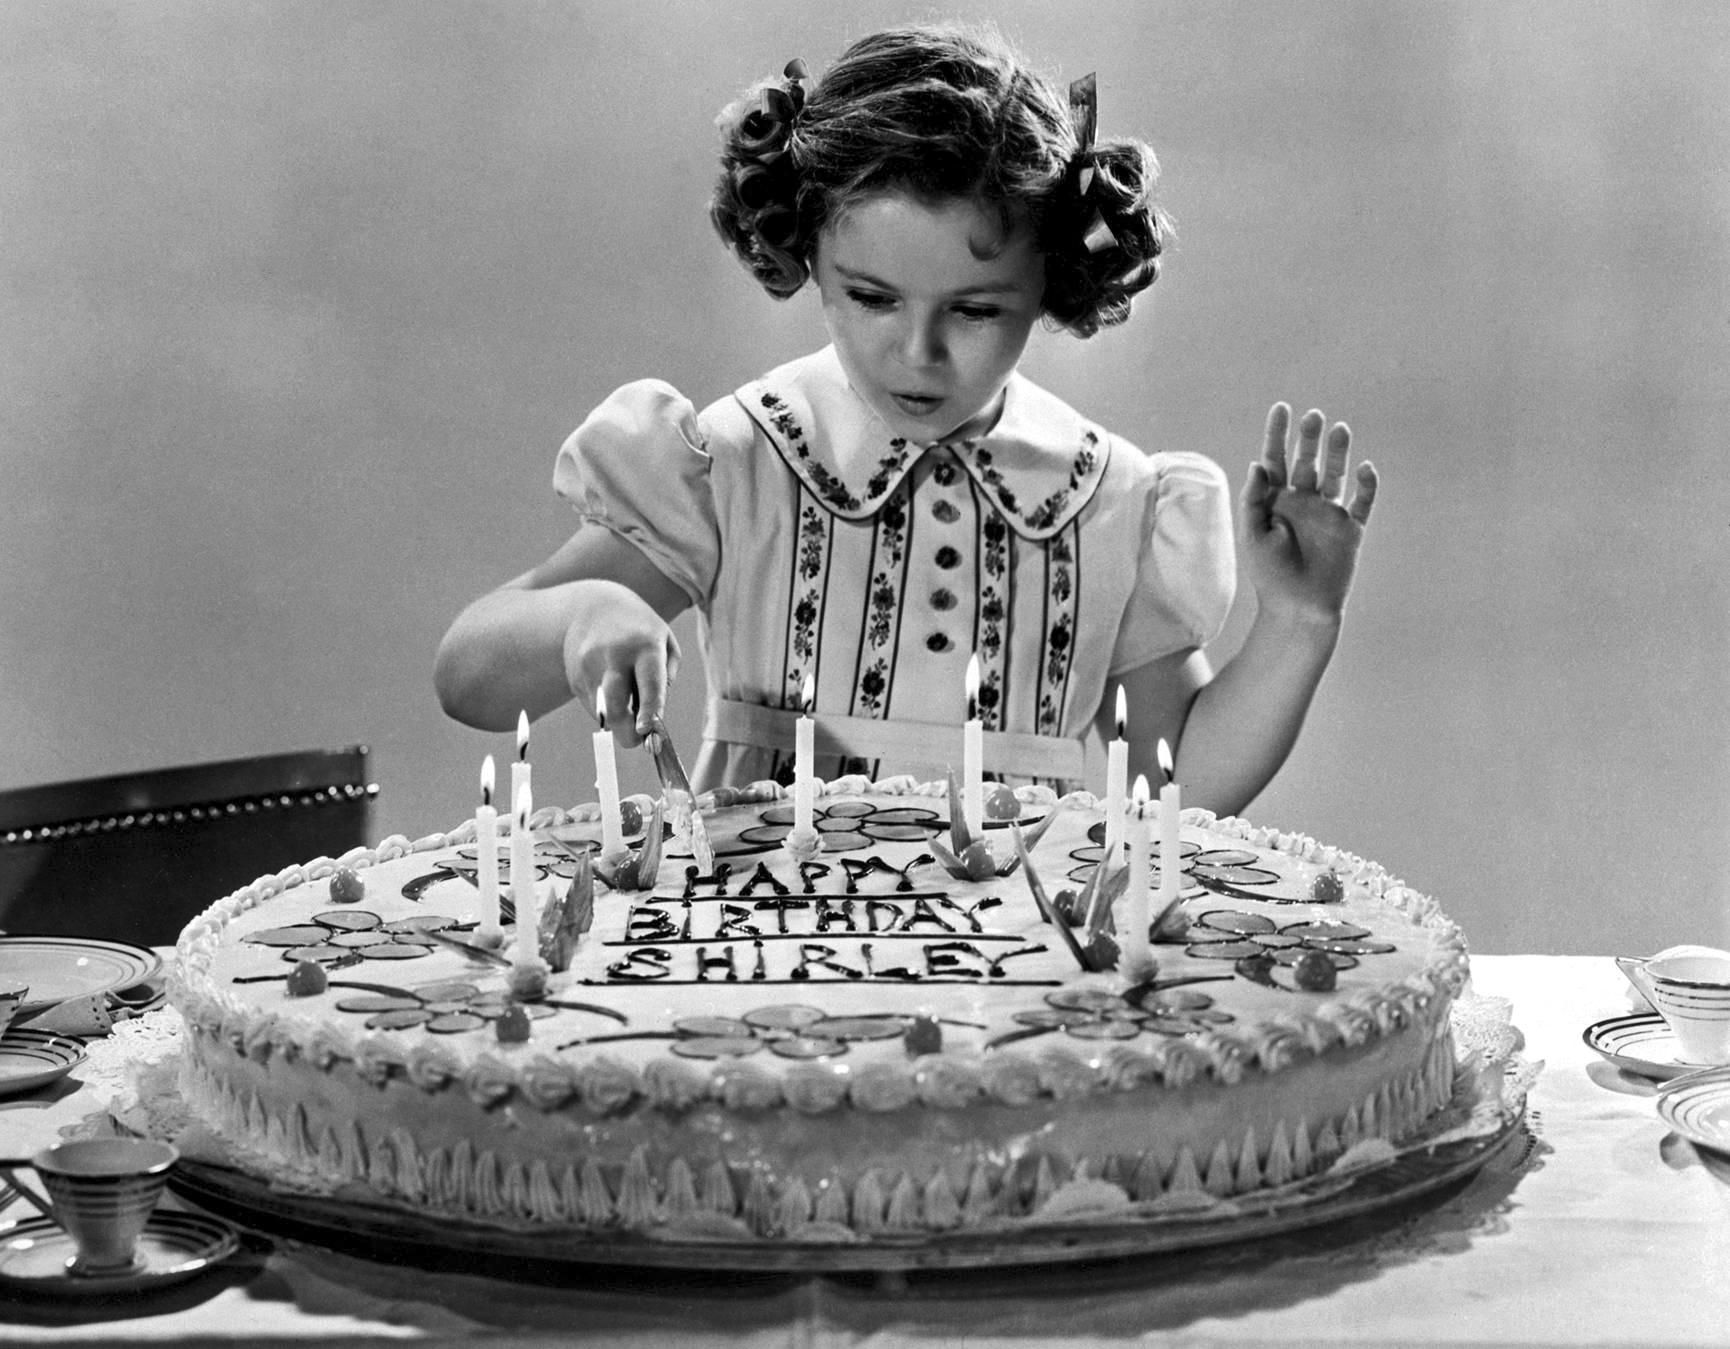 Happy Birthday Shirley Cake Images